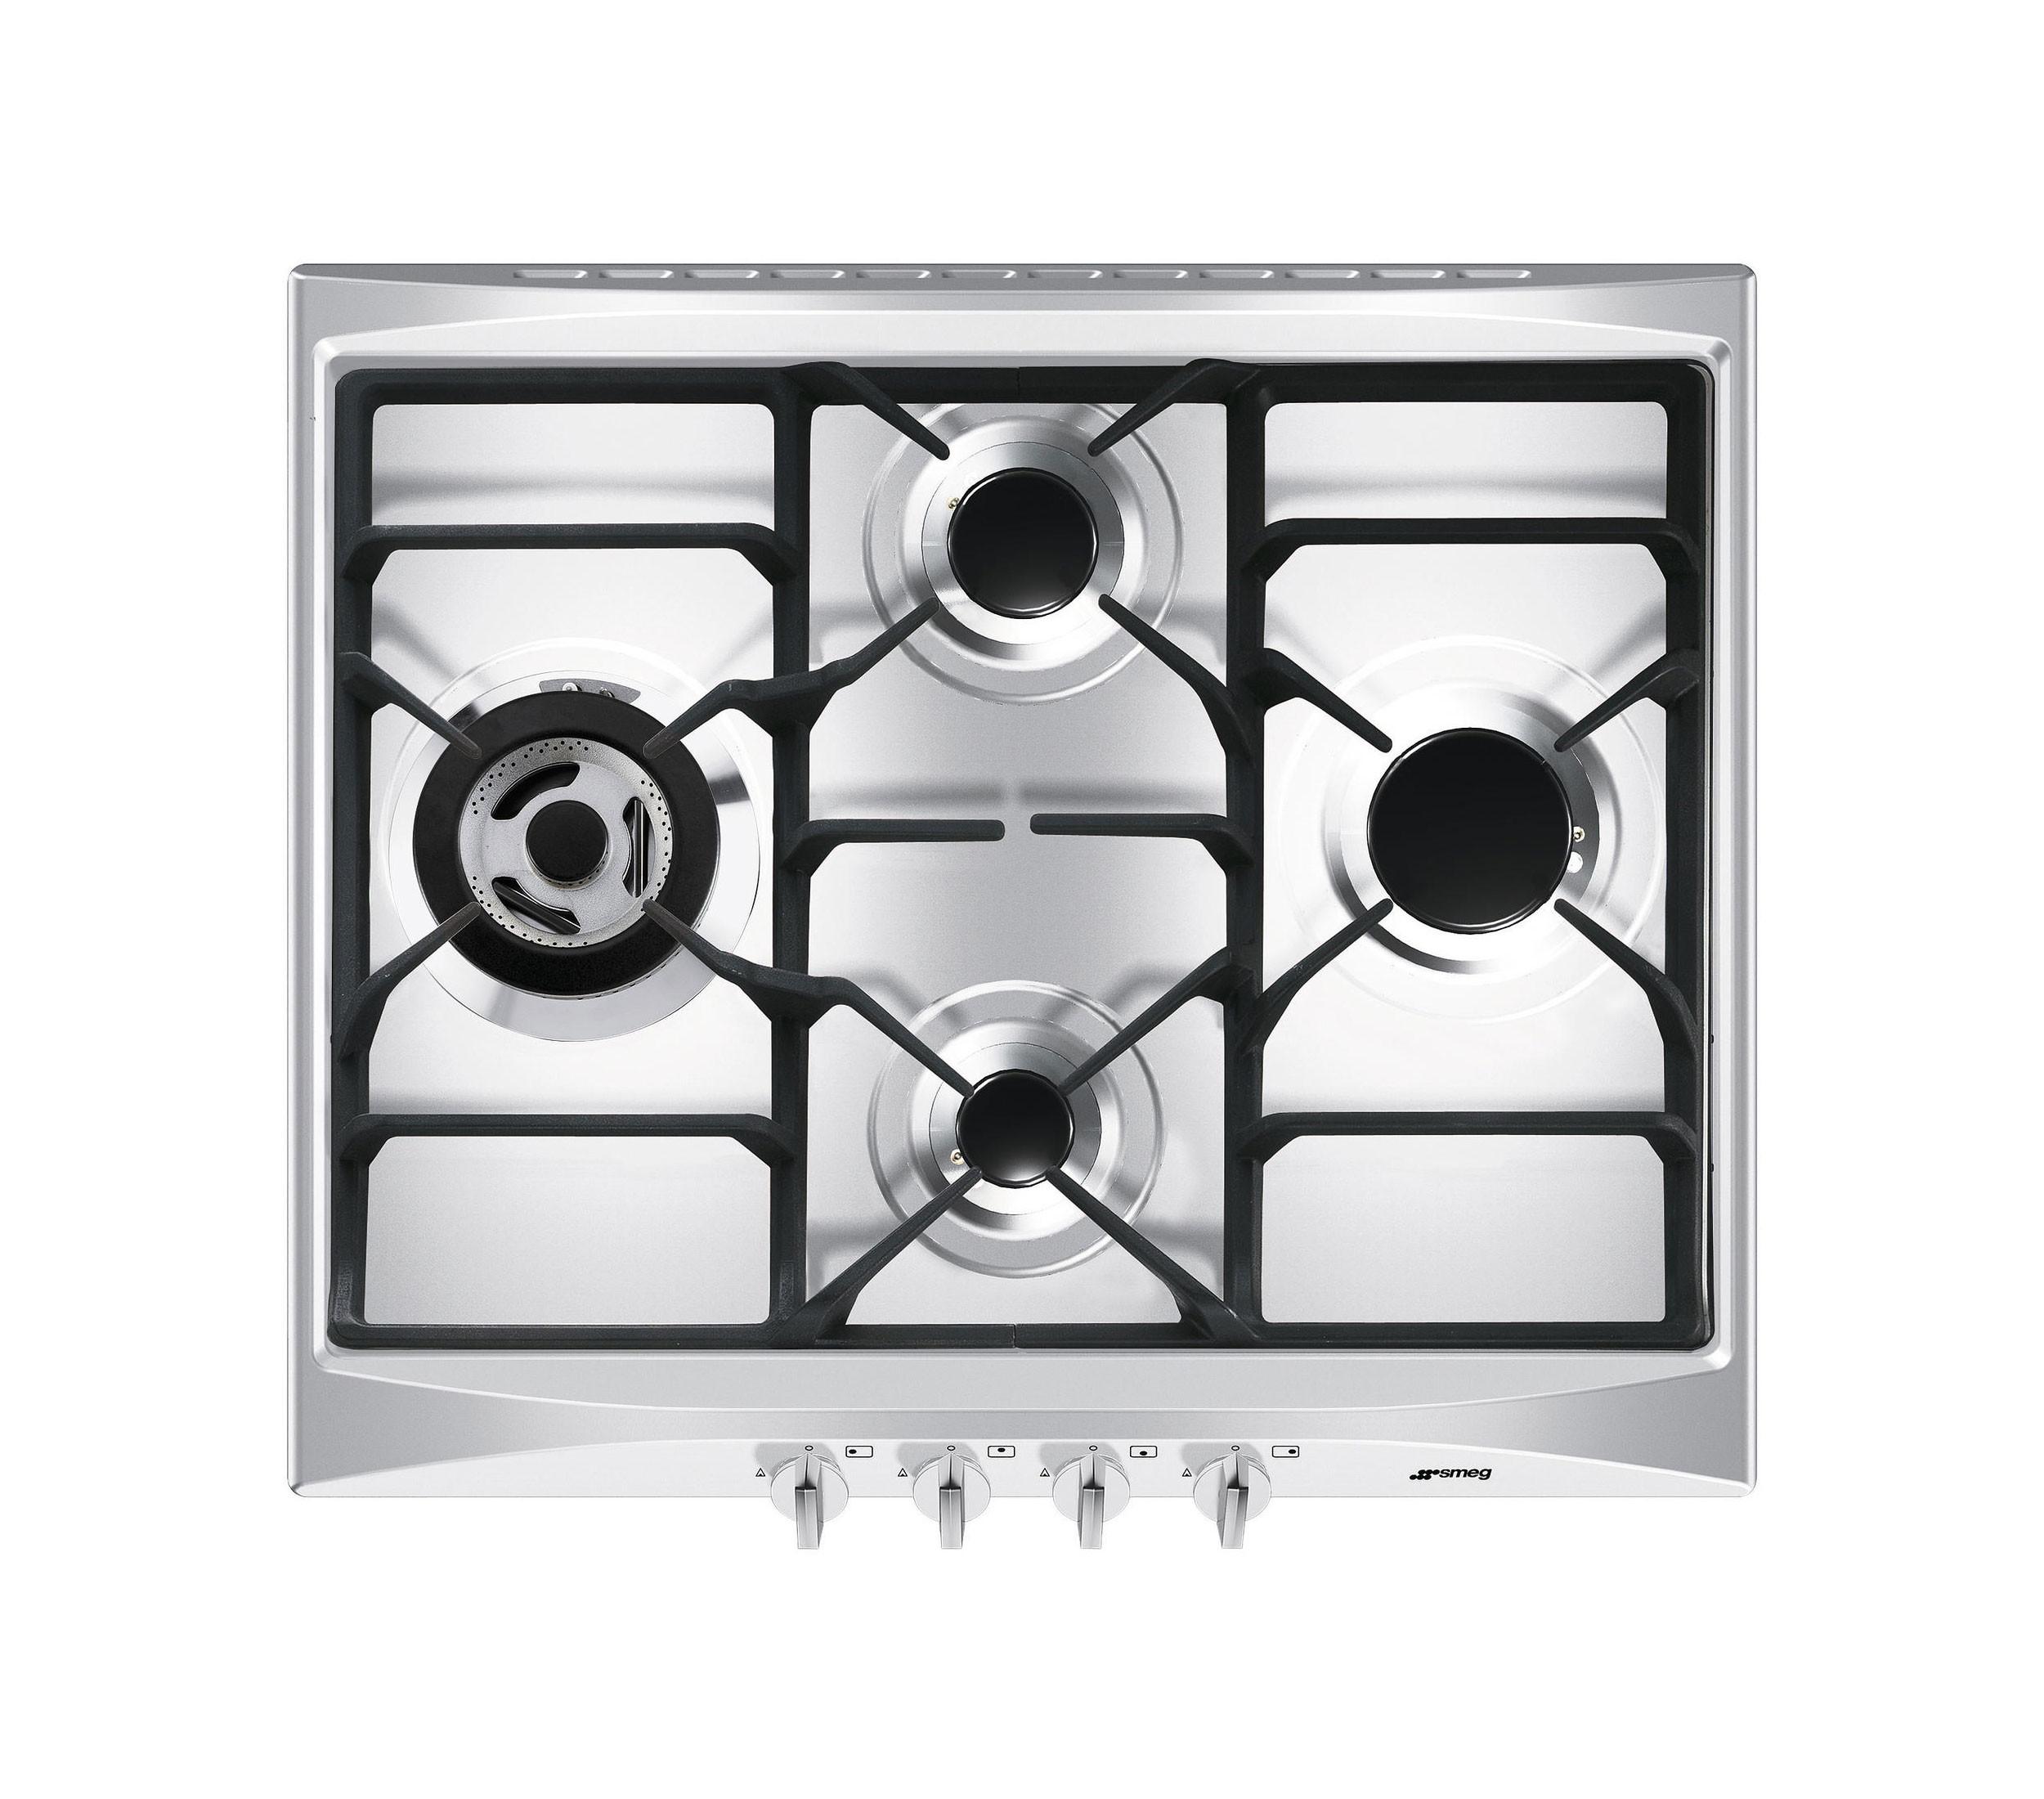 Buy smeg sr264xgh cucina 60cm stainless steel gas hob sr264xgh - Smeg cucina gas ...